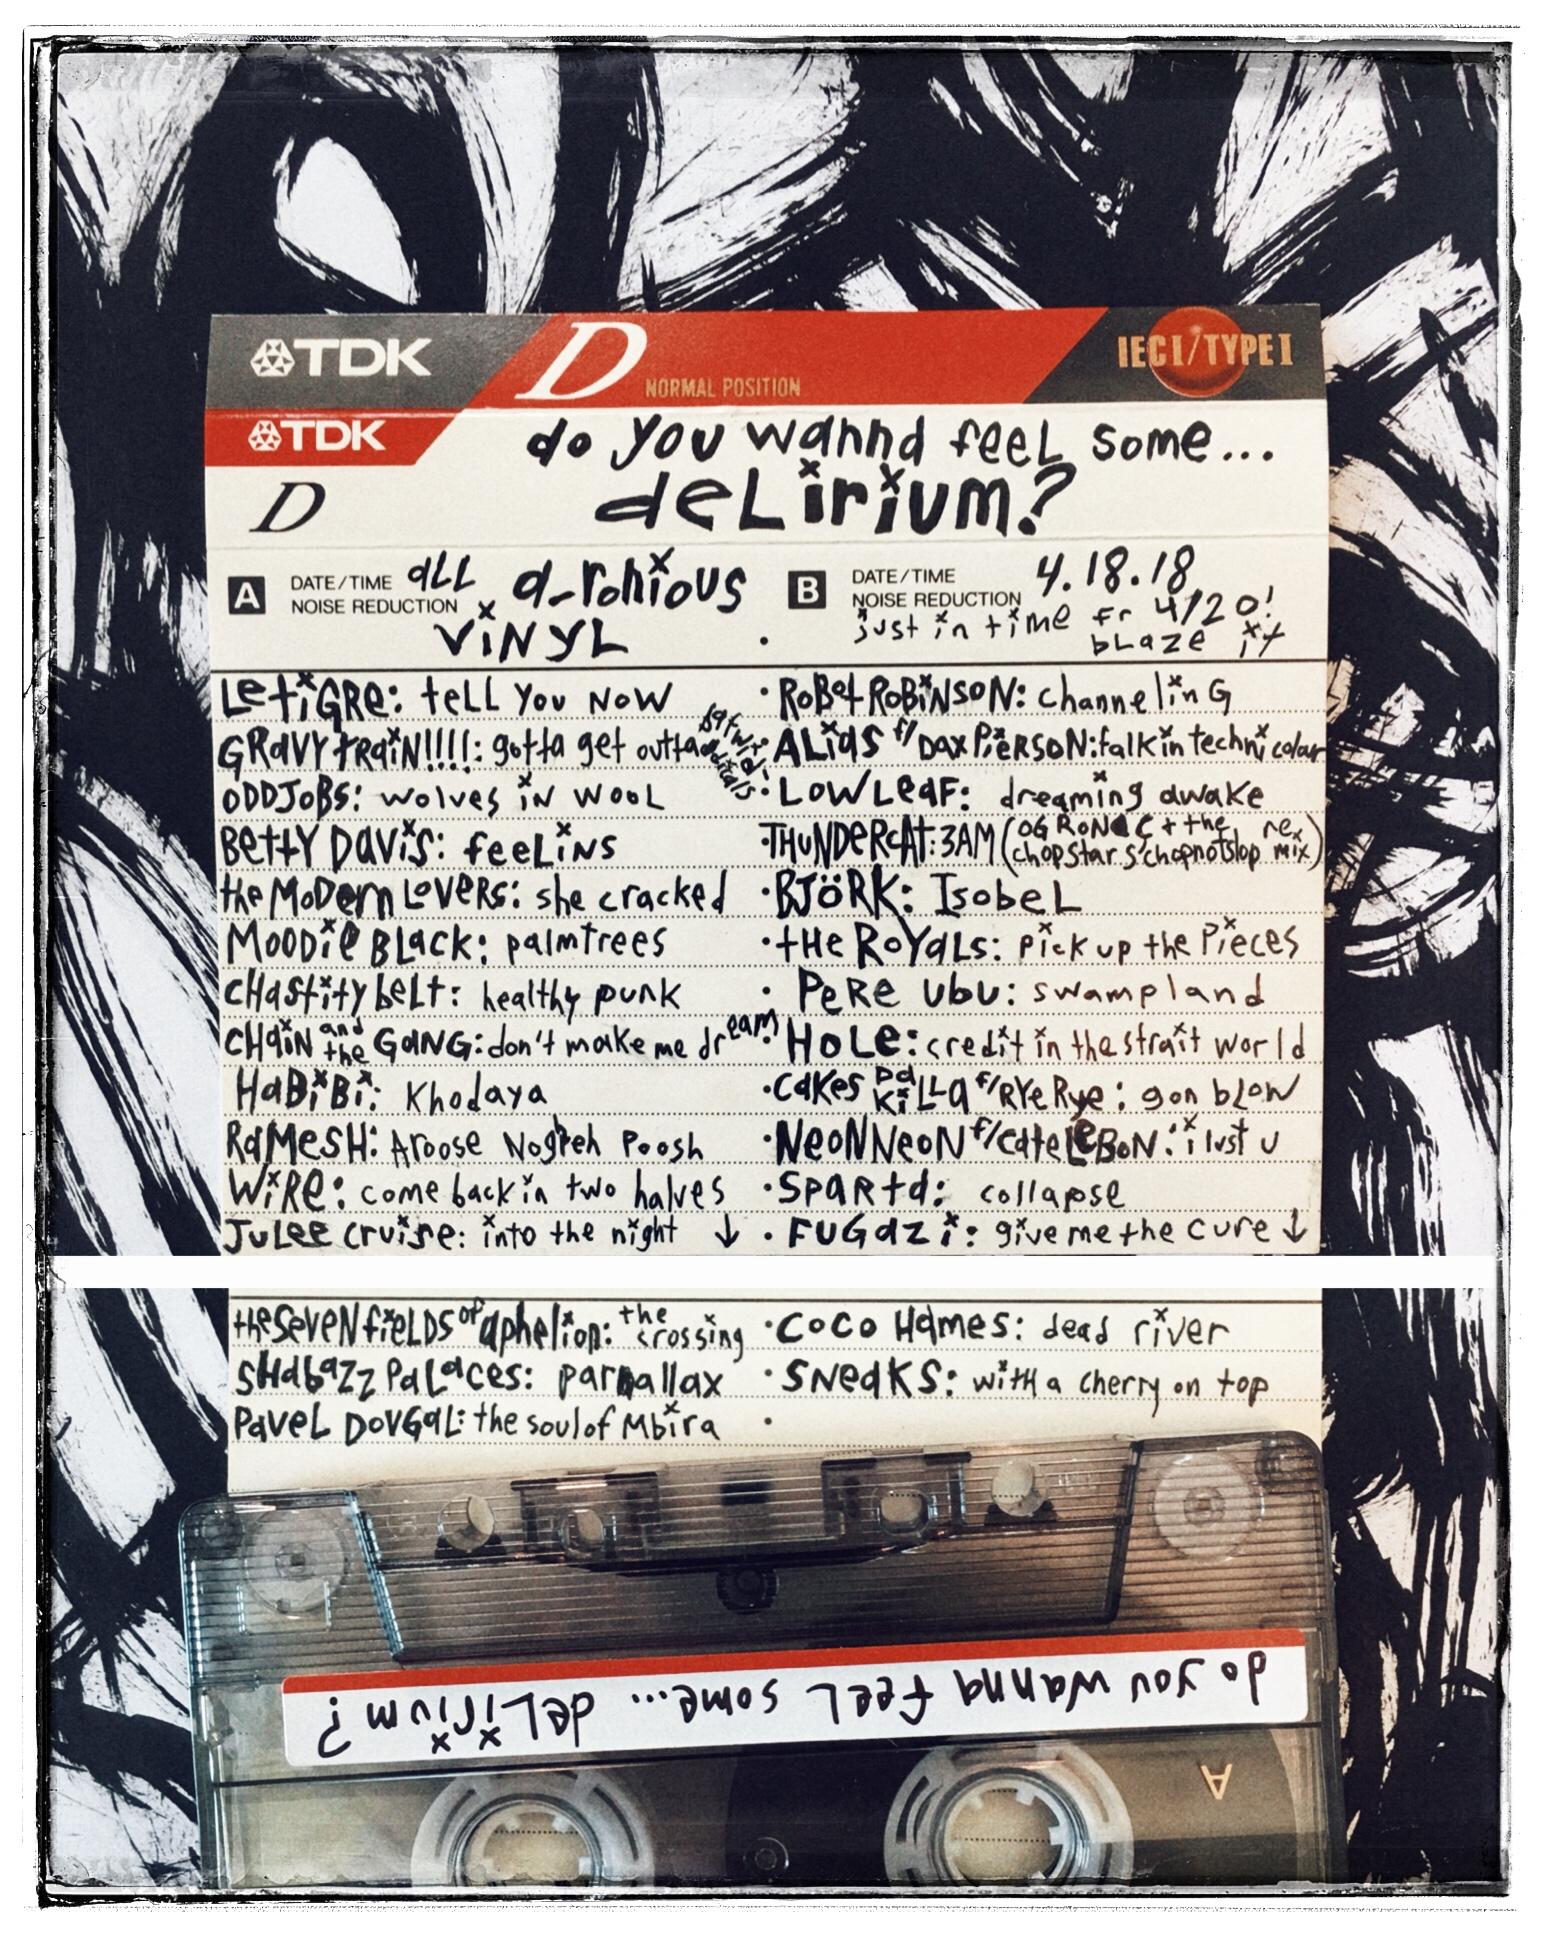 do you wanna feel some... delirium?.jpg